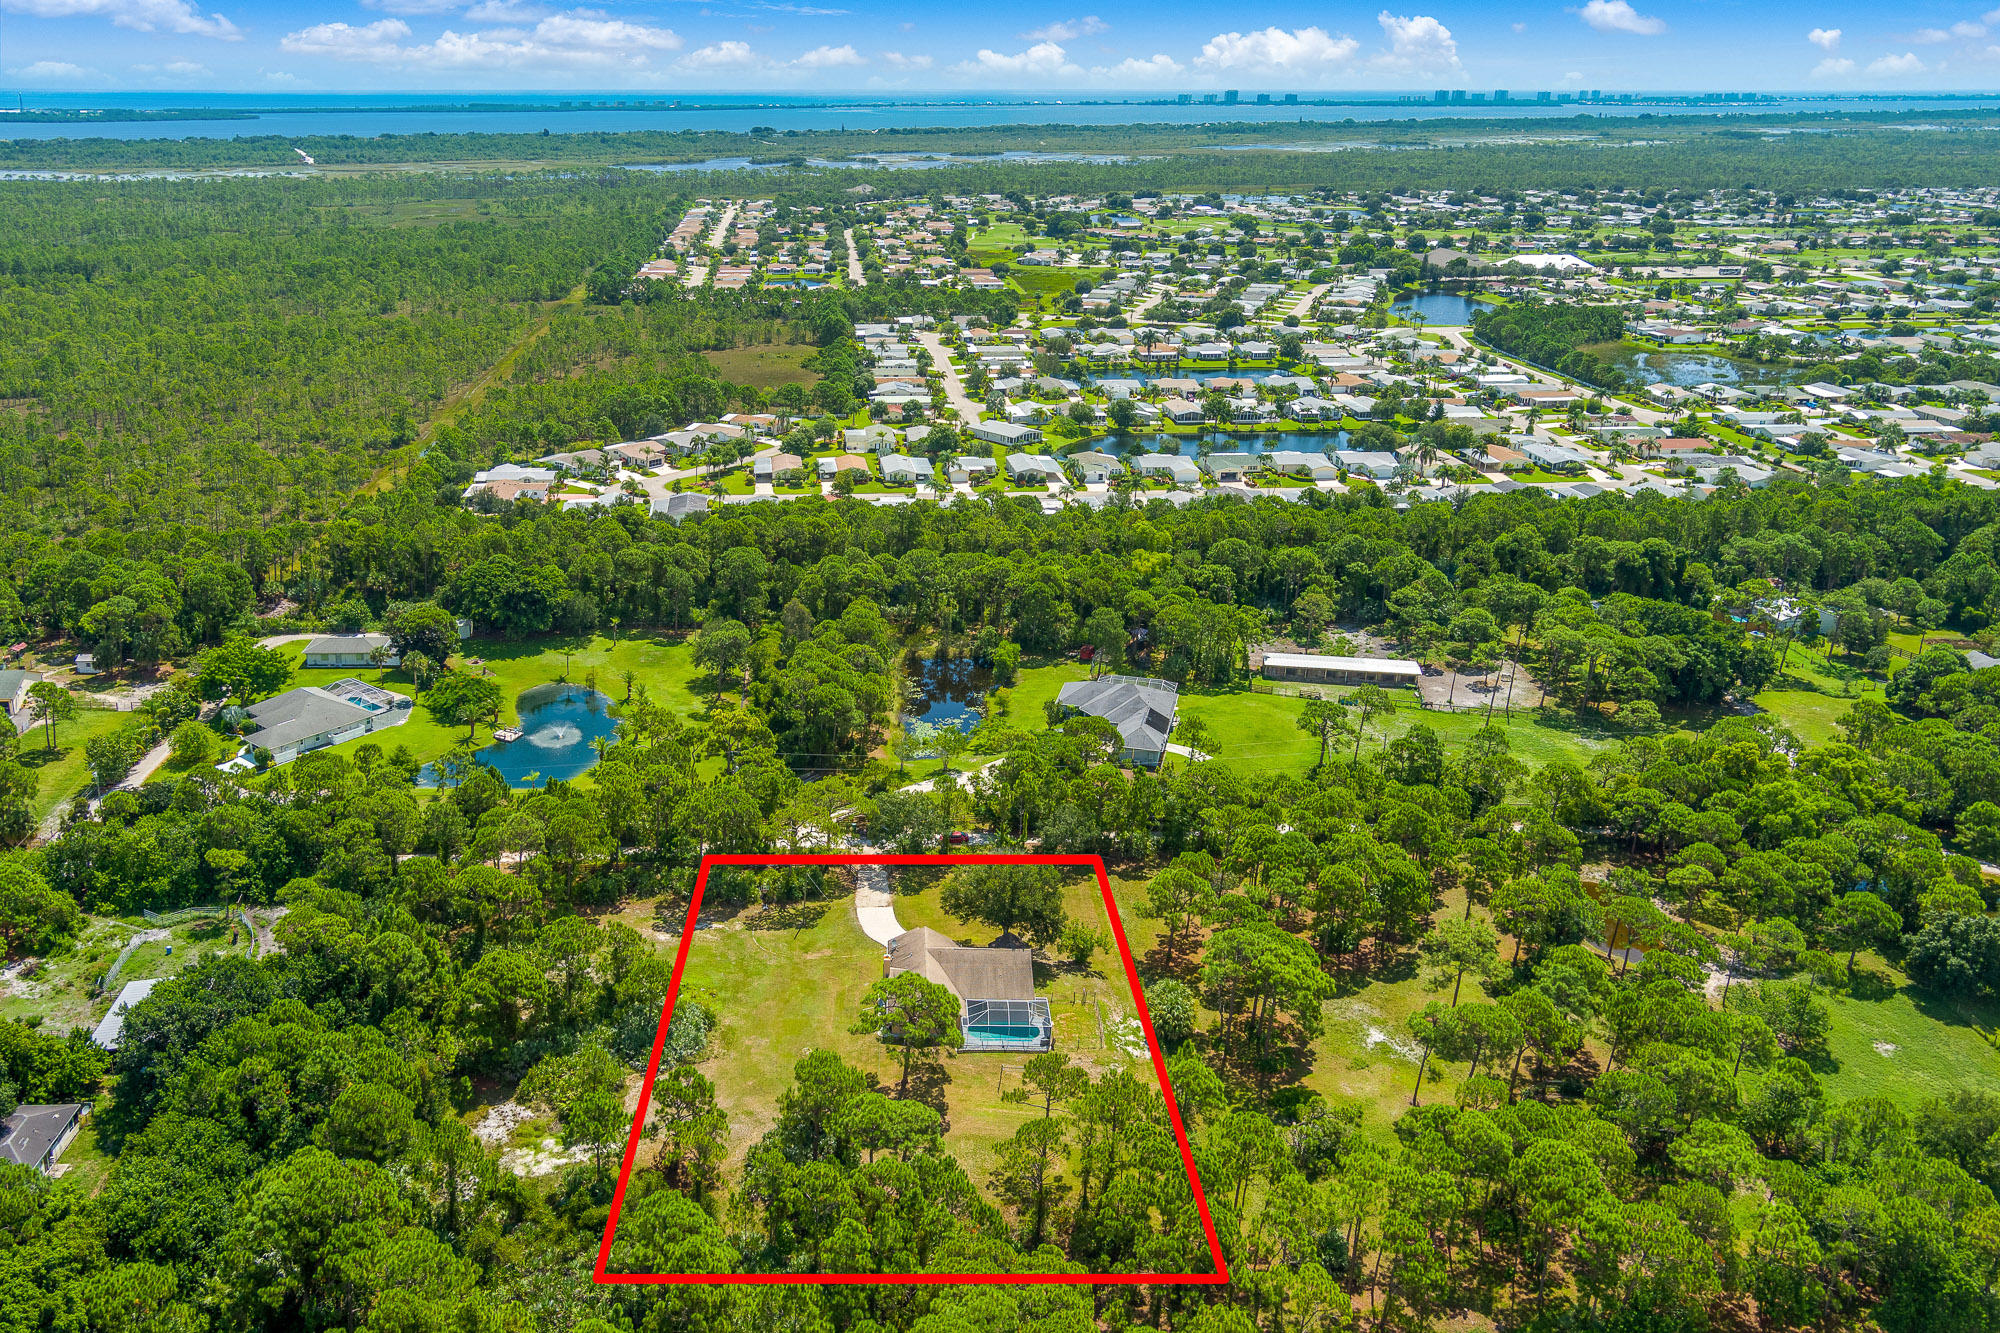 7601 Gulloti Pl, Port St Lucie, FL 34952